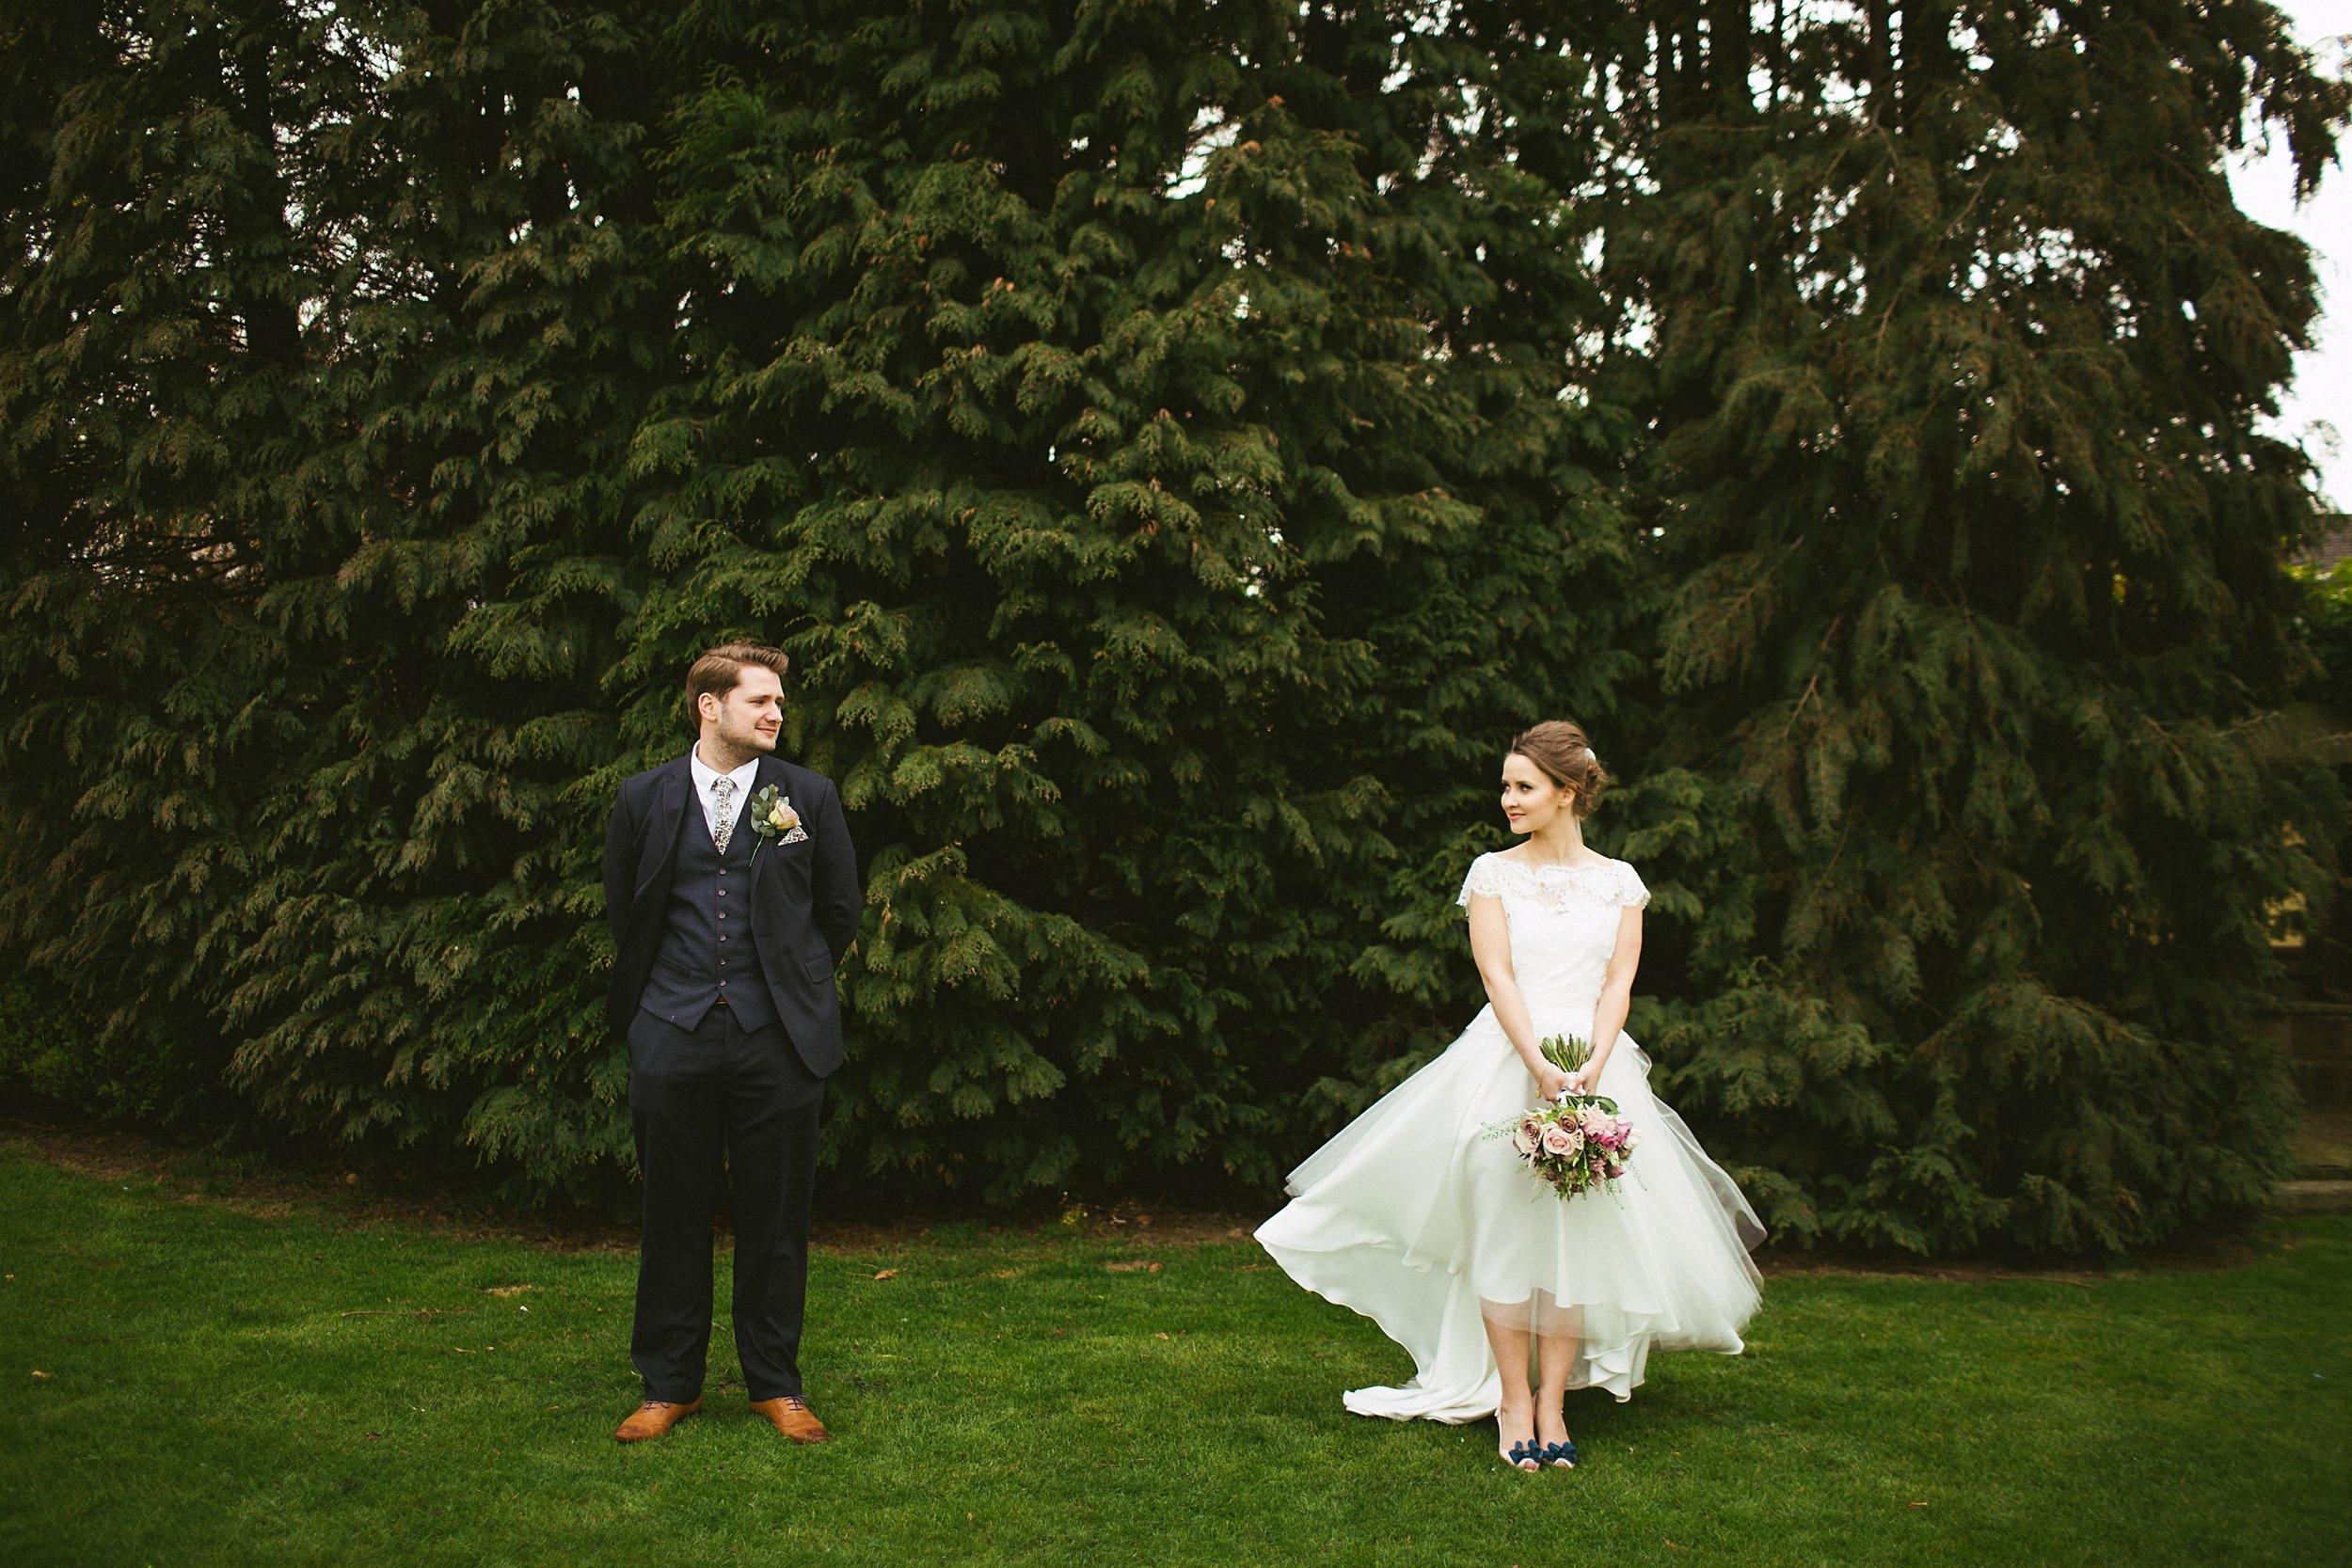 Samantha-Yorkshire-Sheffield-Bespoke-Vintage-Lace-Tulle-Bride-Wedding-Dress-Susanna-Greening-Derbyshire-2